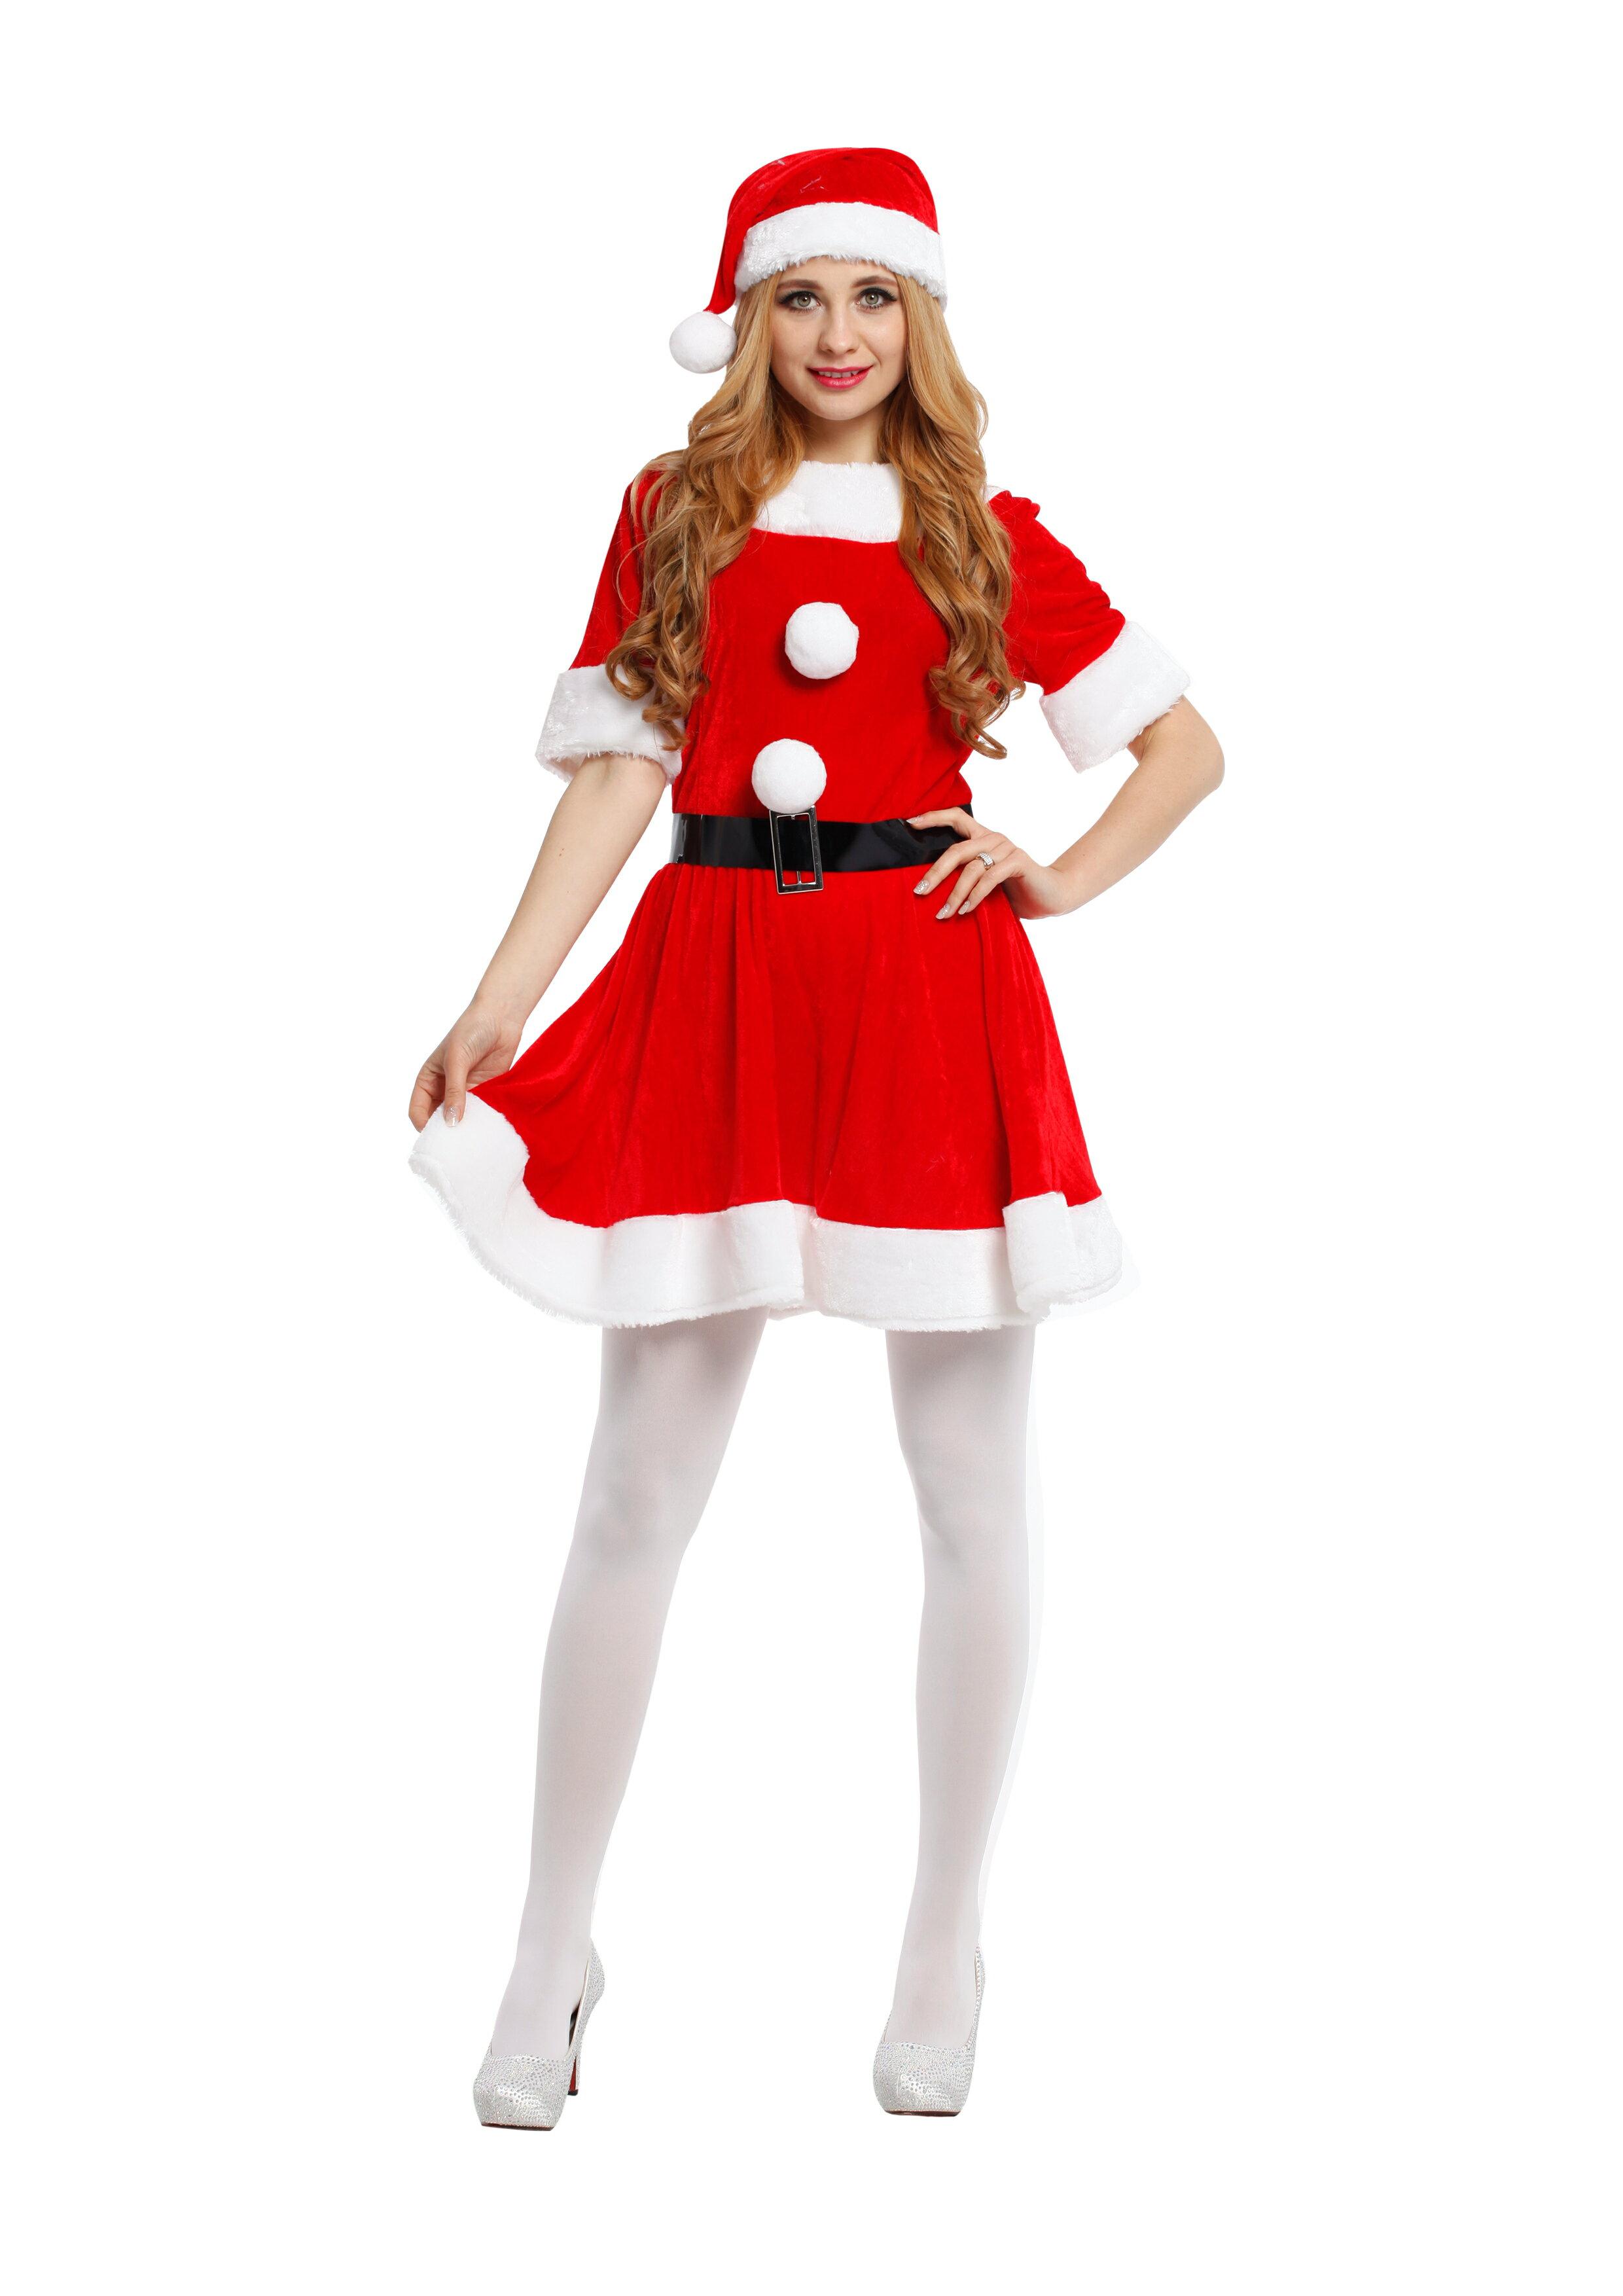 X射线【X380024】 俏丽圣诞服, 舞会/尾牙/万圣/圣诞/大人变装/cosplay/表演/摄影/写真/话剧/童话/性感/交换礼物